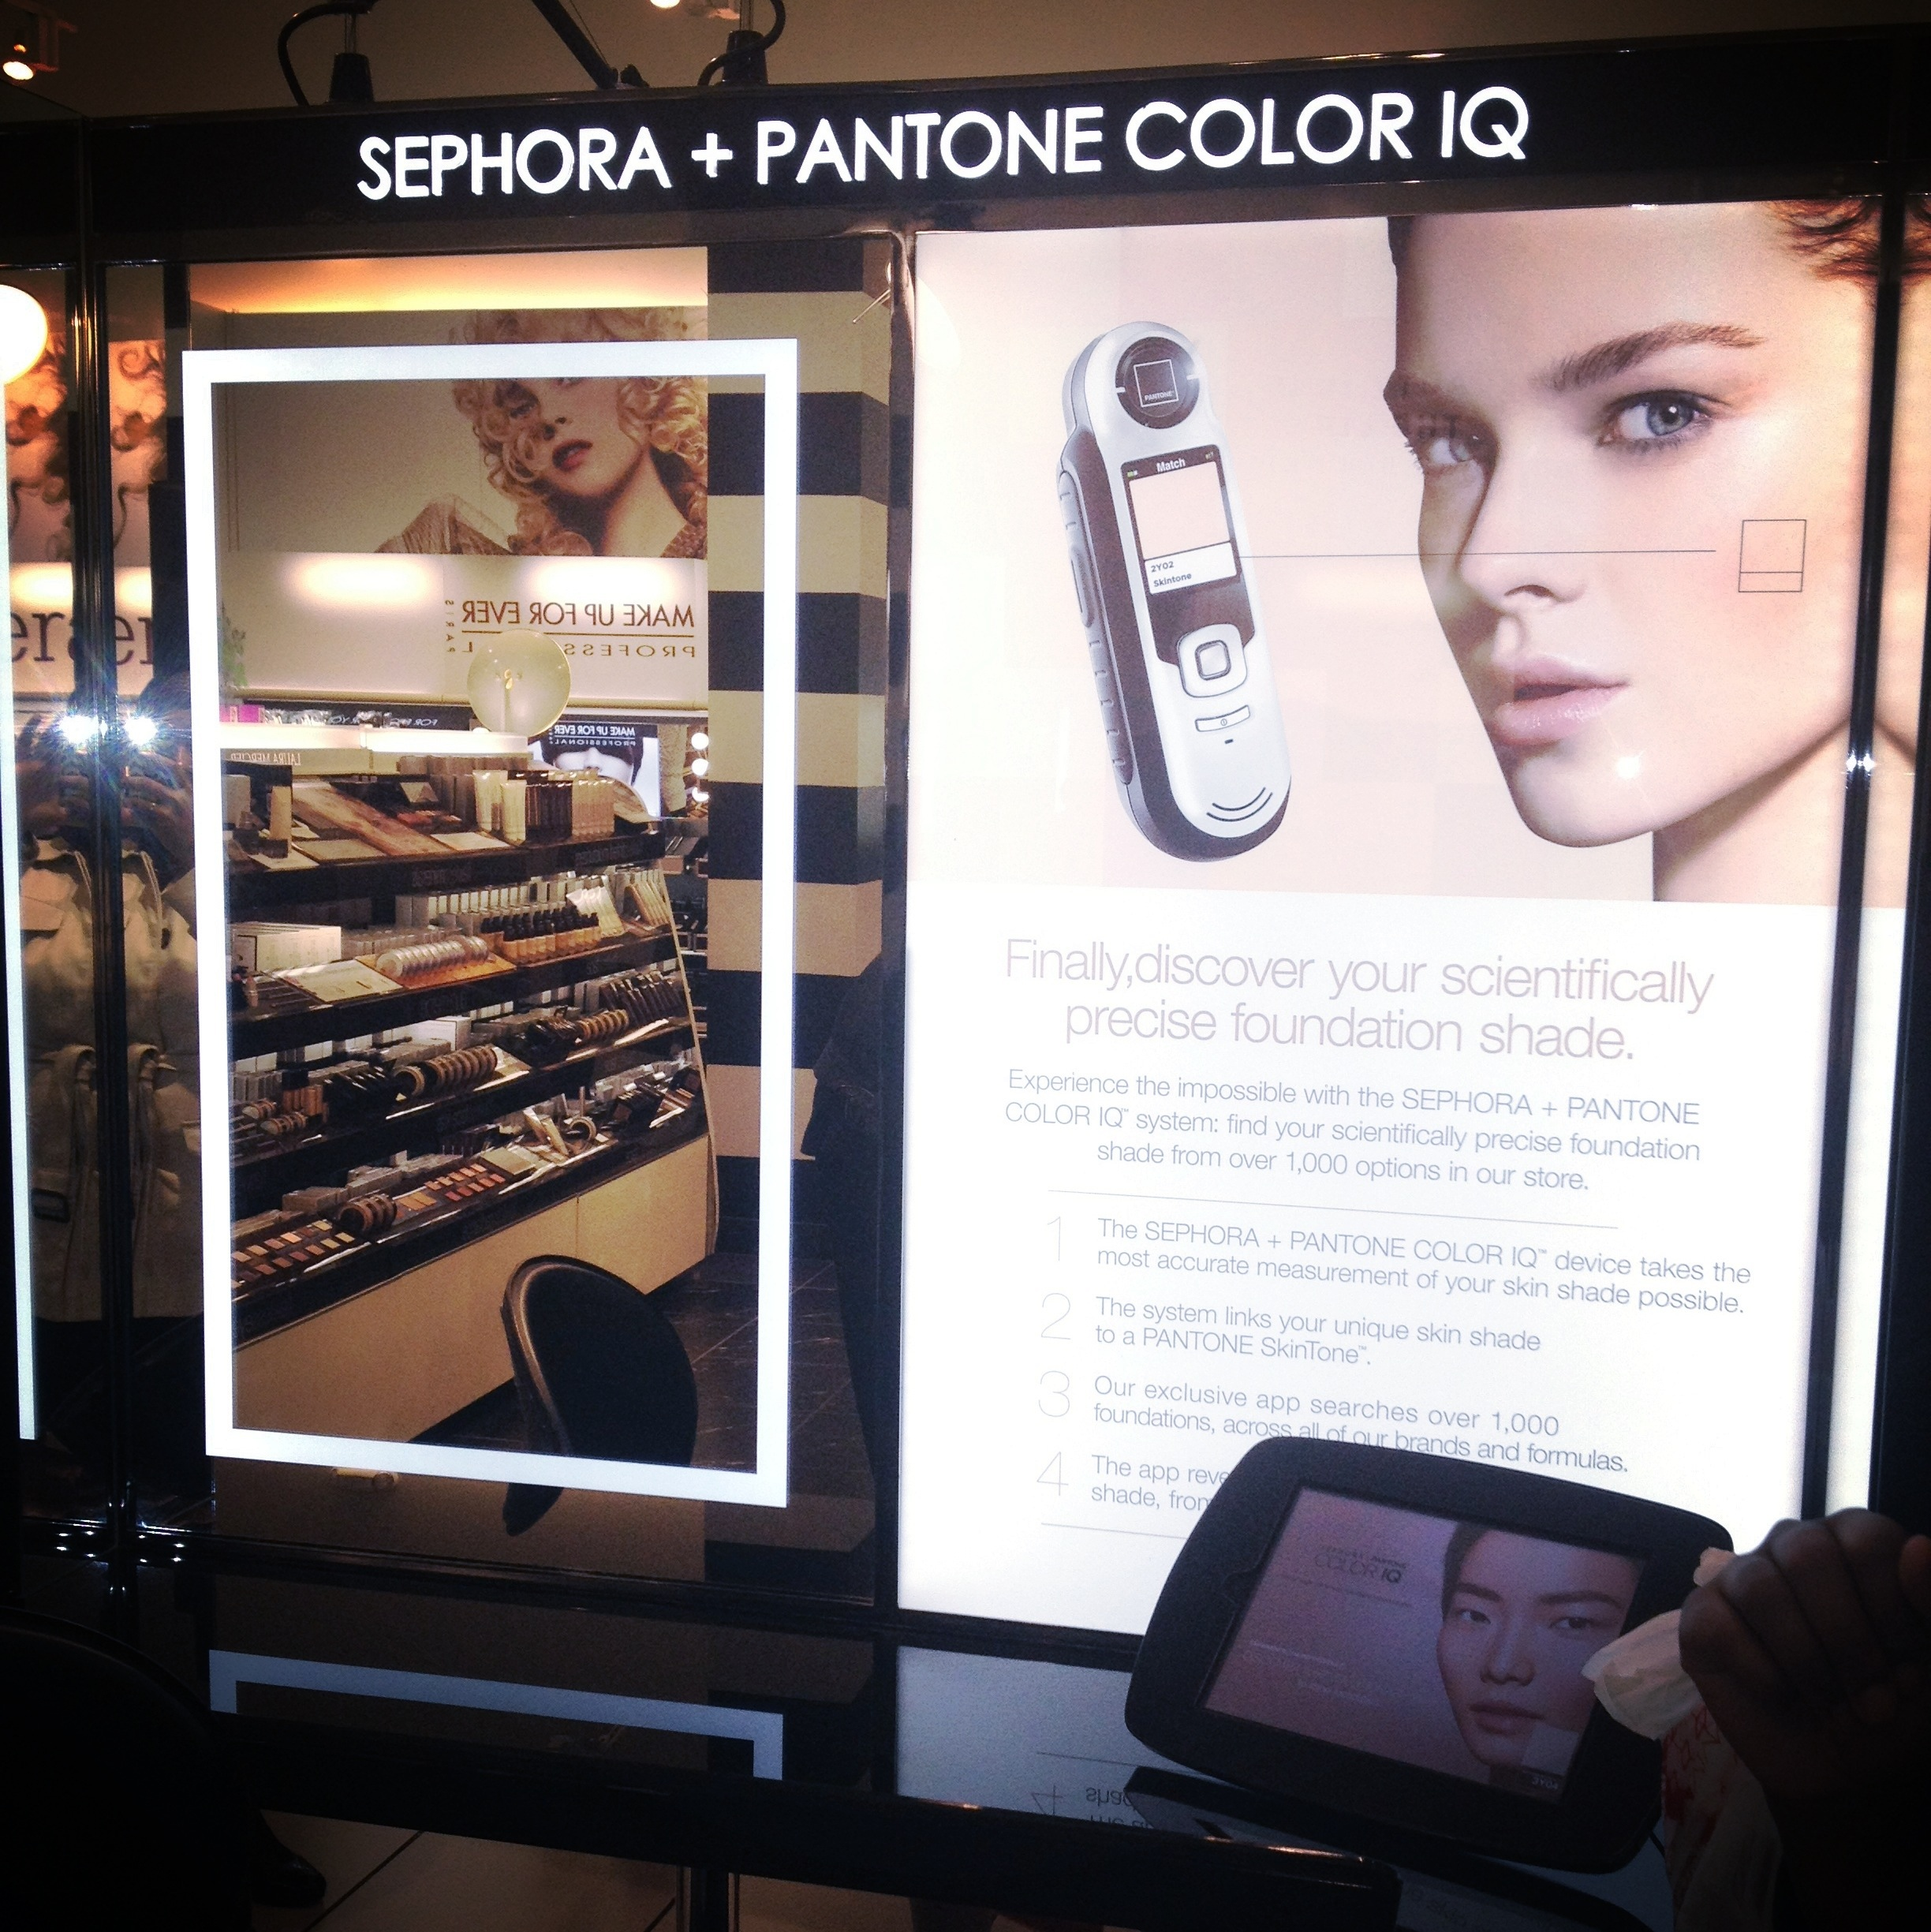 Perfect Foundation Match: Sephora + Pantone Color IQ